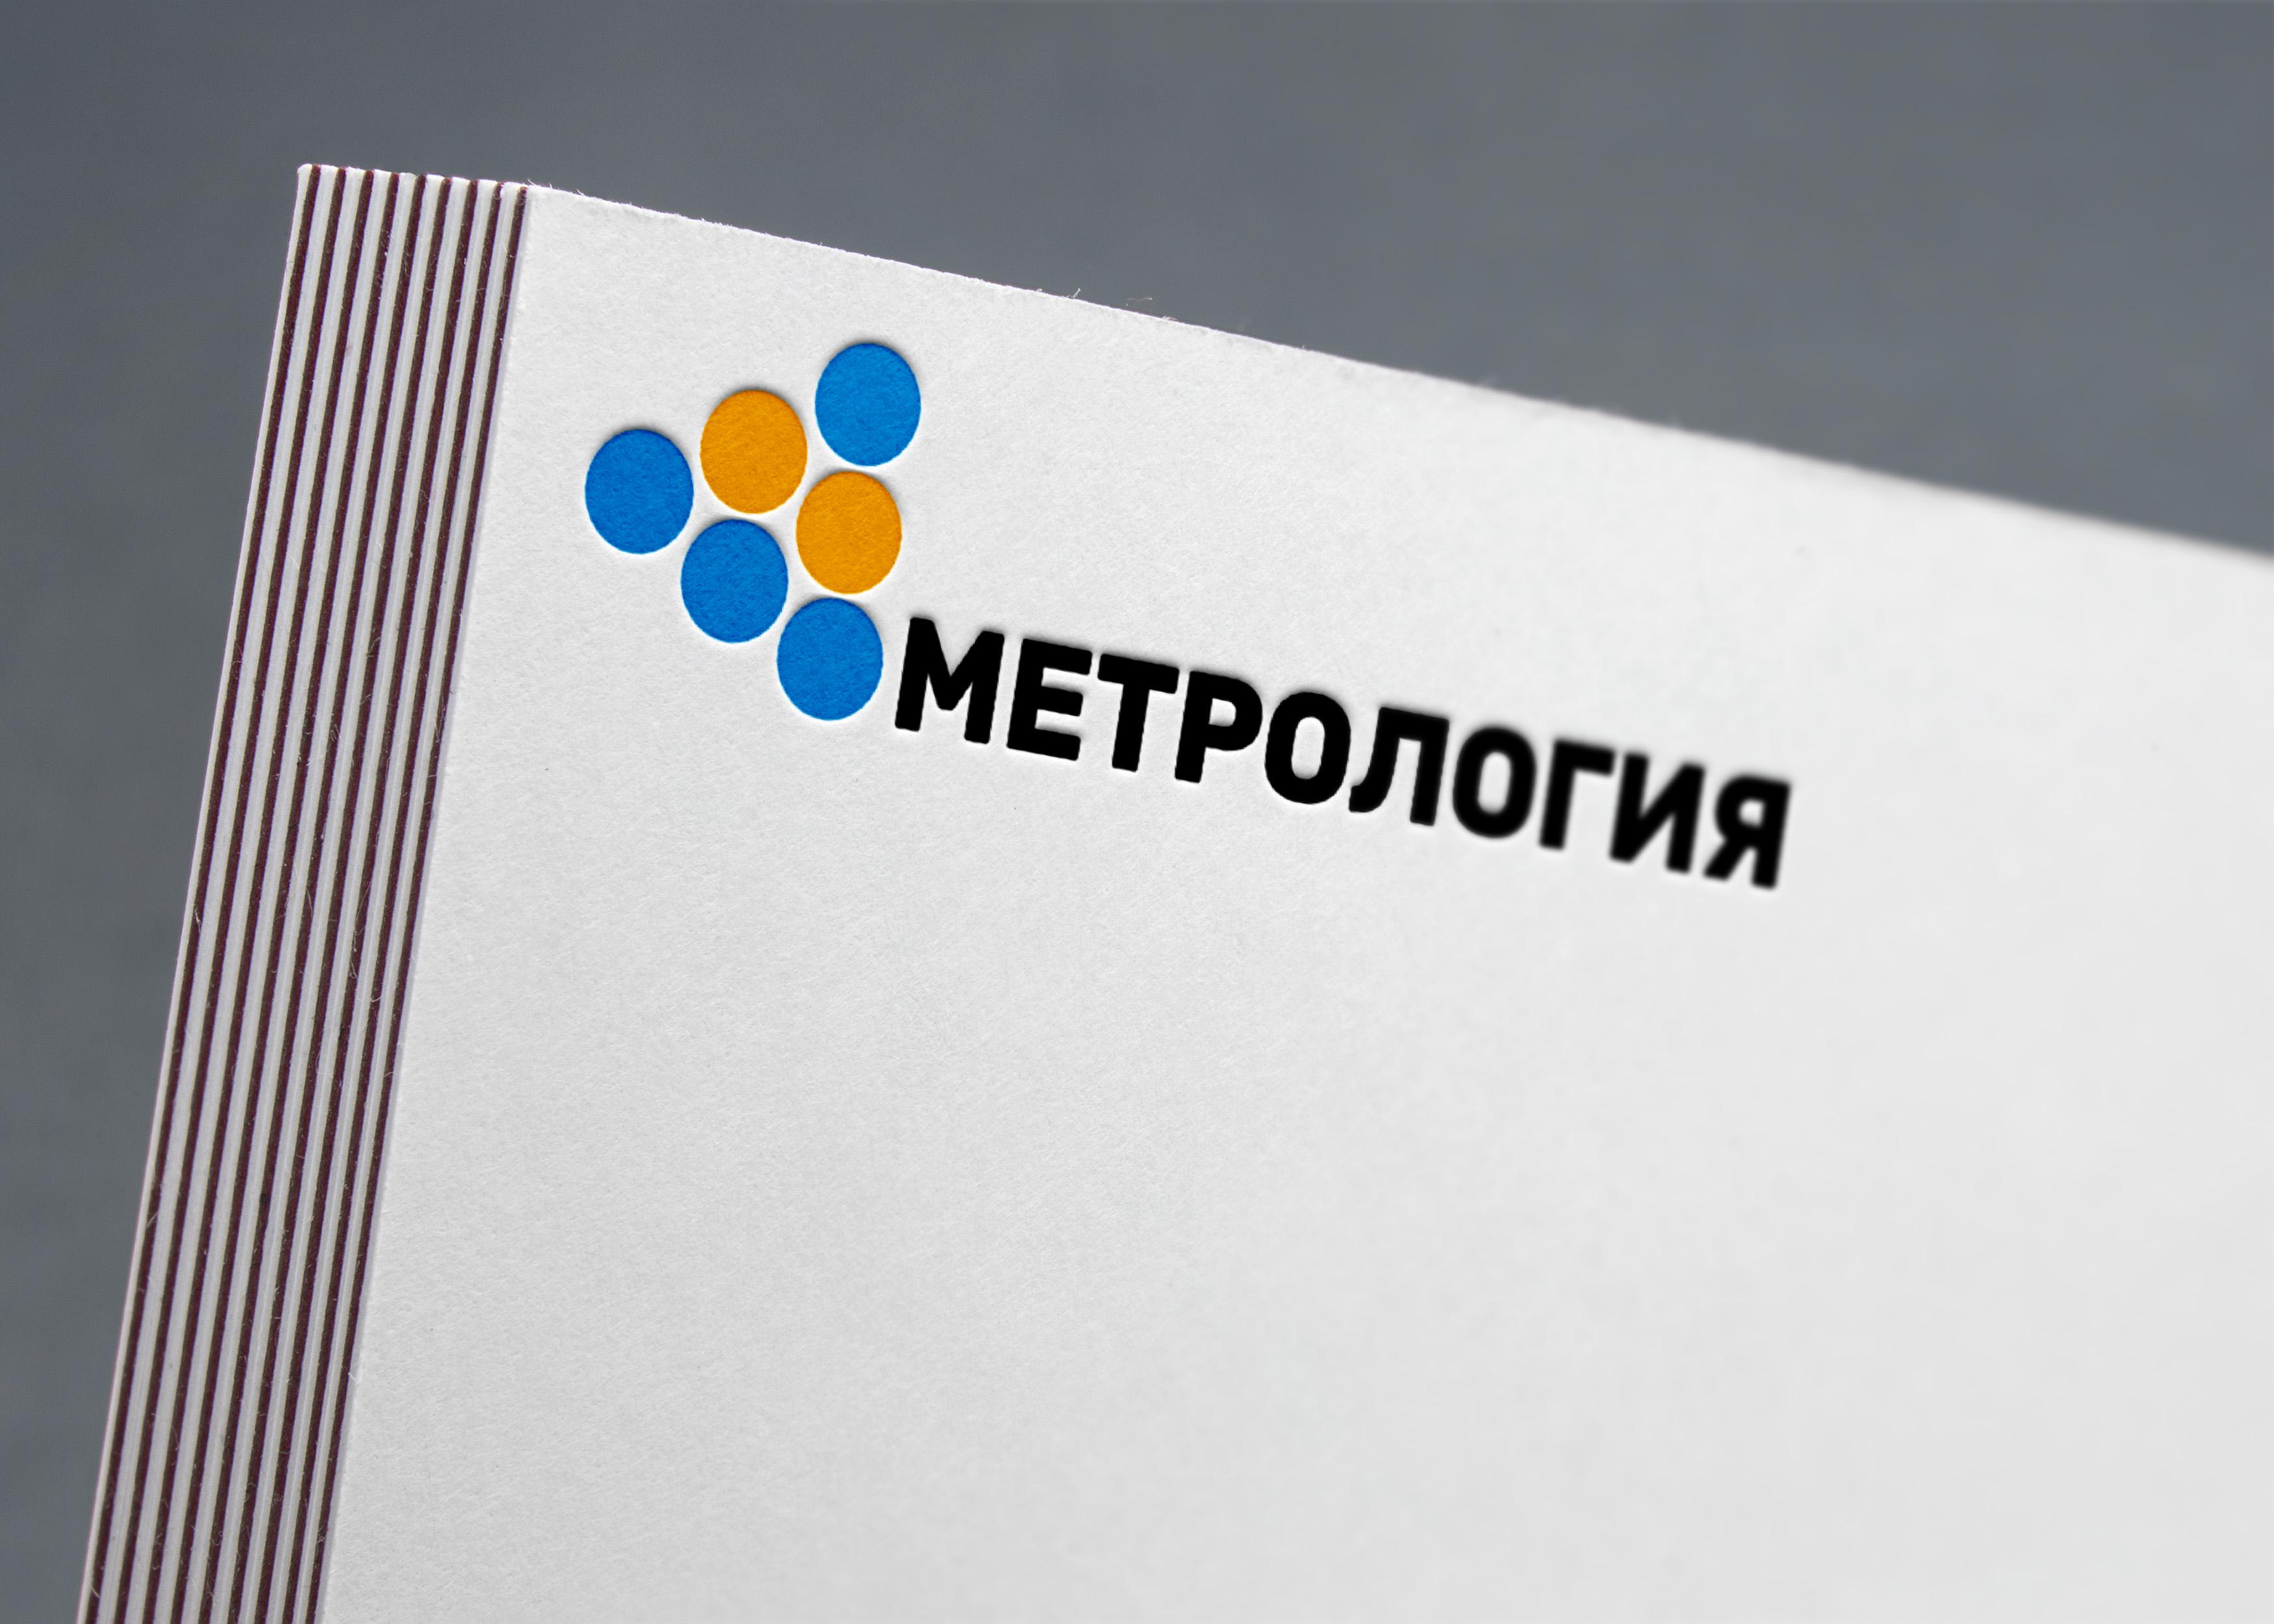 Разработать логотип, визитку, фирменный бланк. фото f_10758f4e15cb1867.jpg